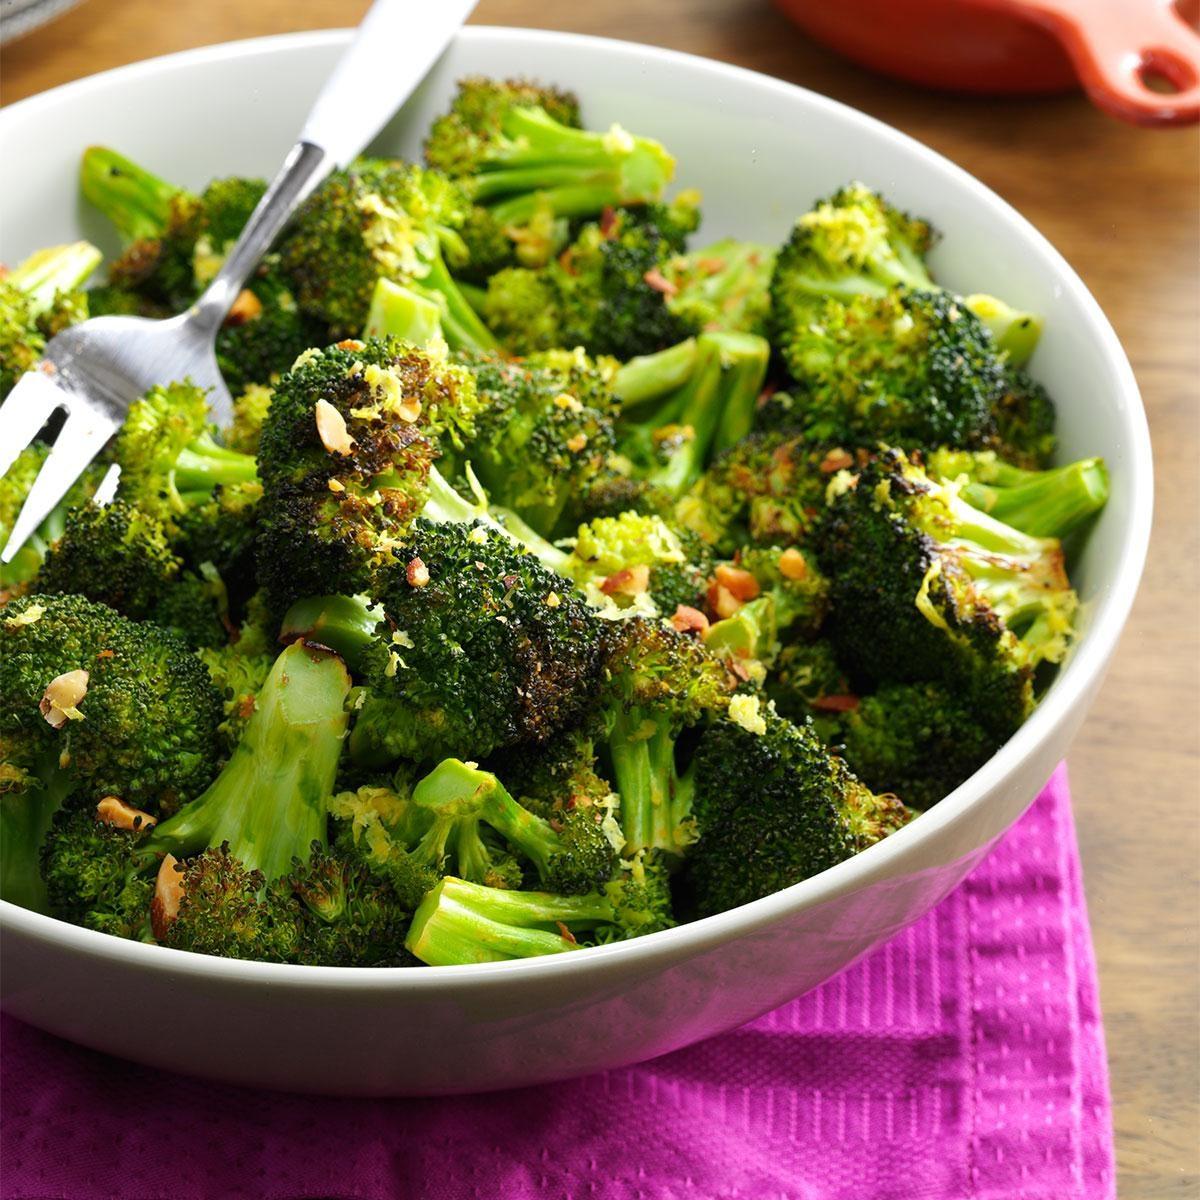 Lemon Pepper Roasted Broccoli